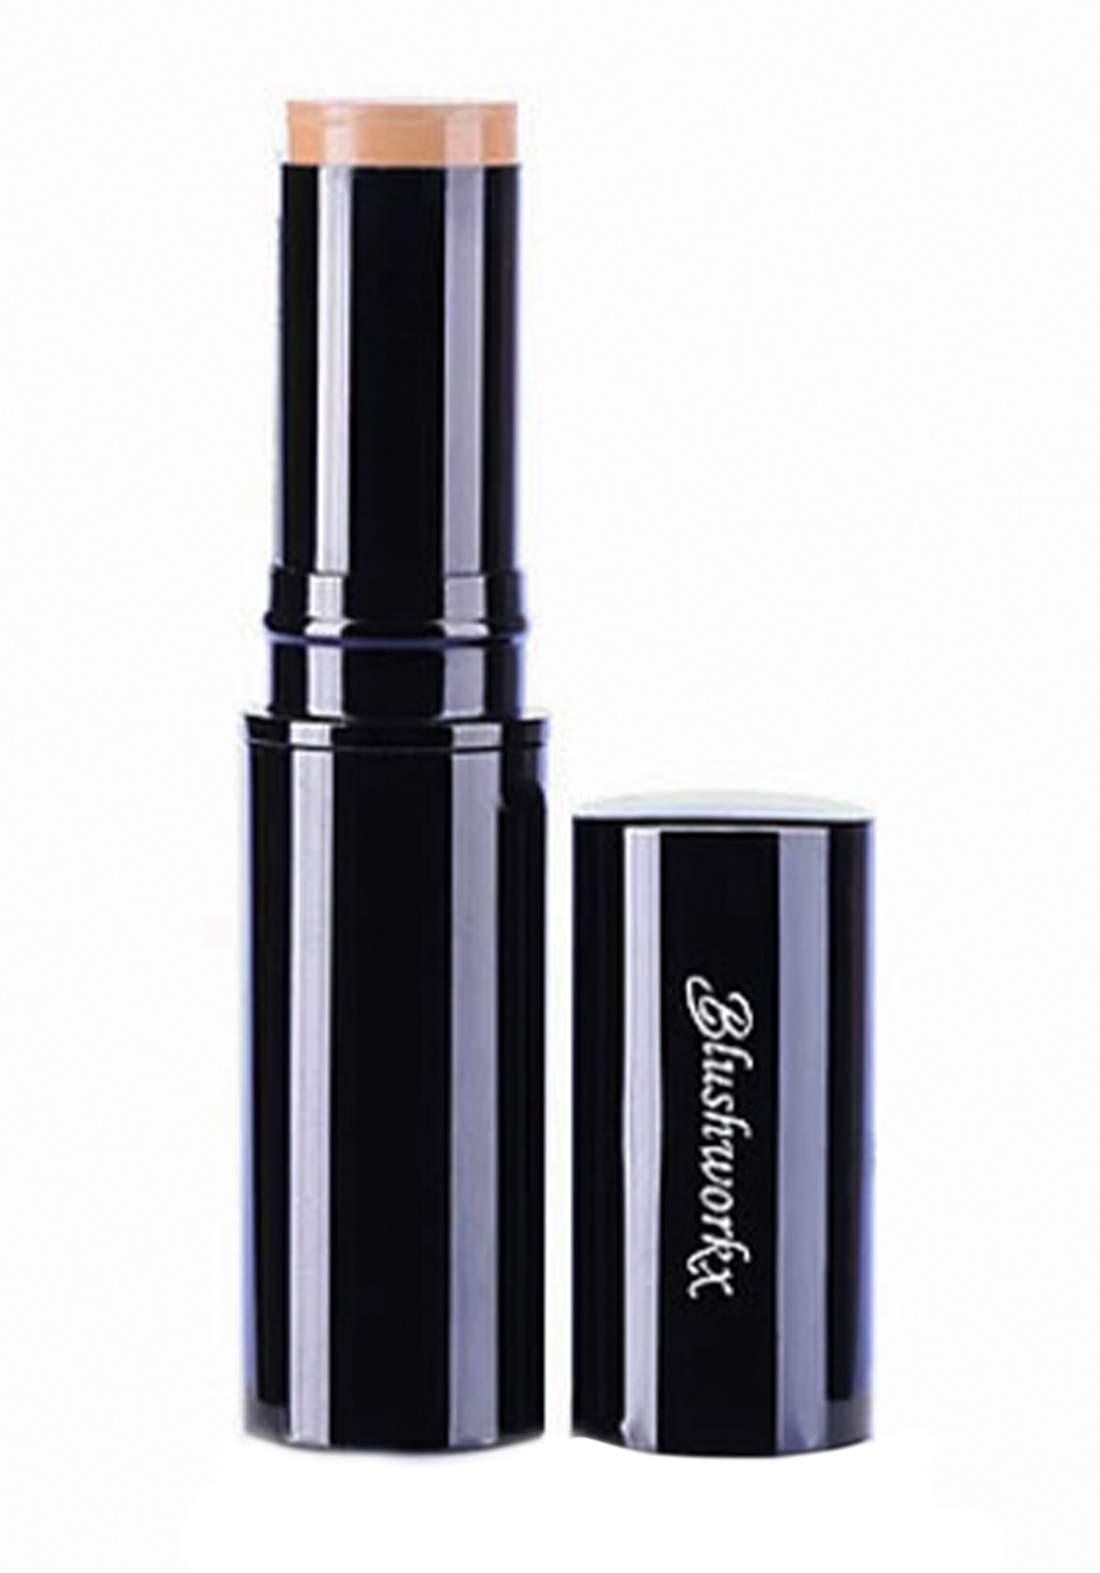 Blushworkx Hollywood Flawless Foundation Stick 7g Medium Dark كونسيلر